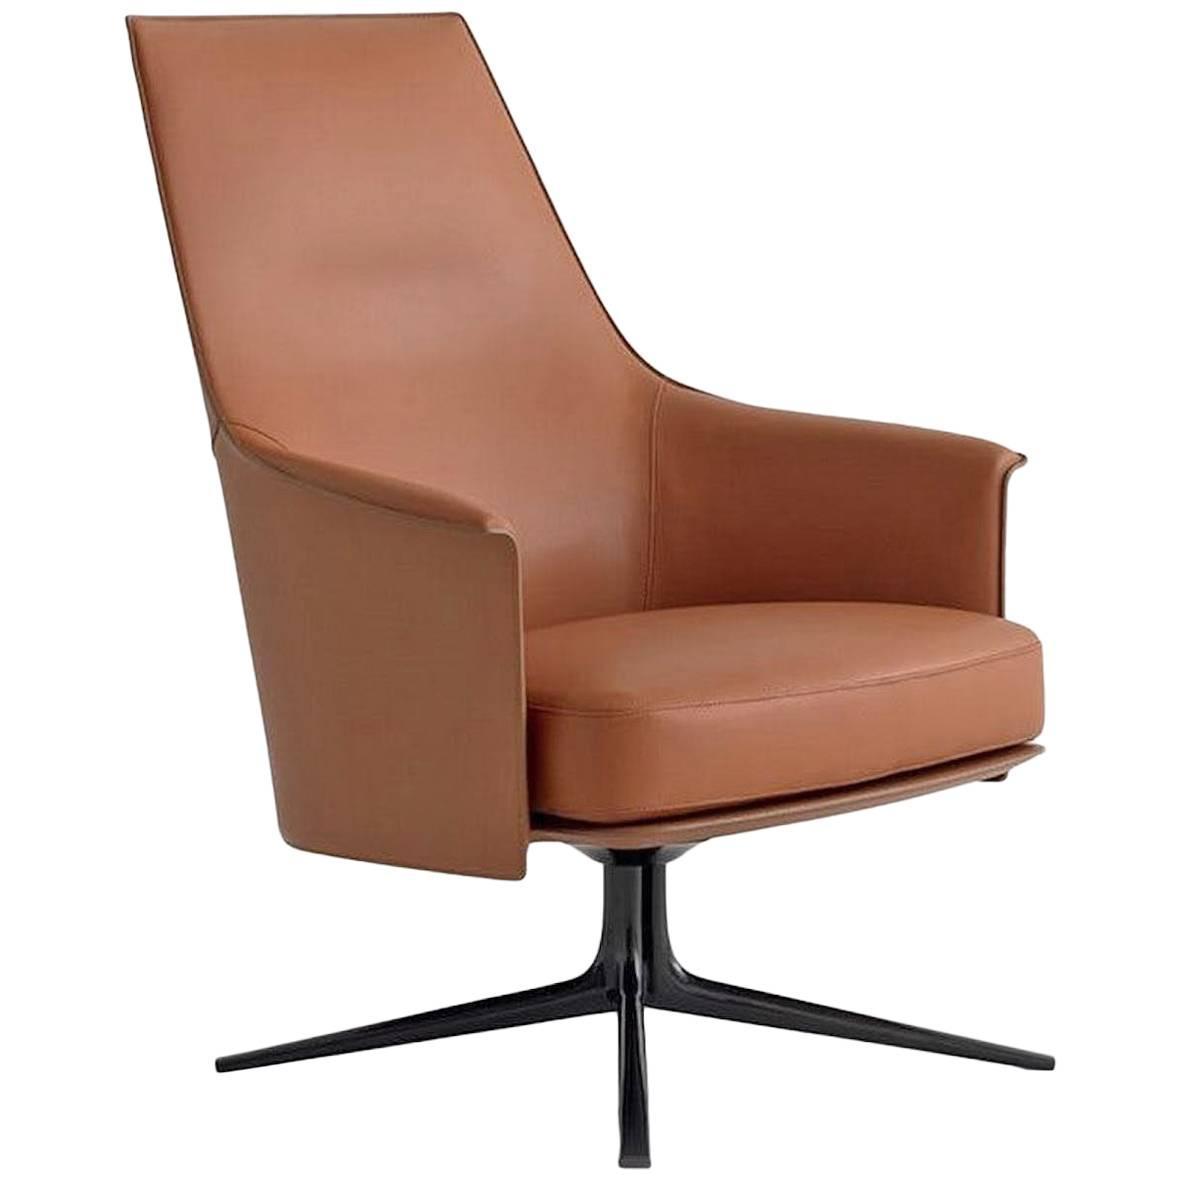 Leather sofa by poltrona frau at 1stdibs - Poliform Stanford High Back Armchair By Jean Marie Massaud Poltrona Frau Grantorino Swivel Armchair